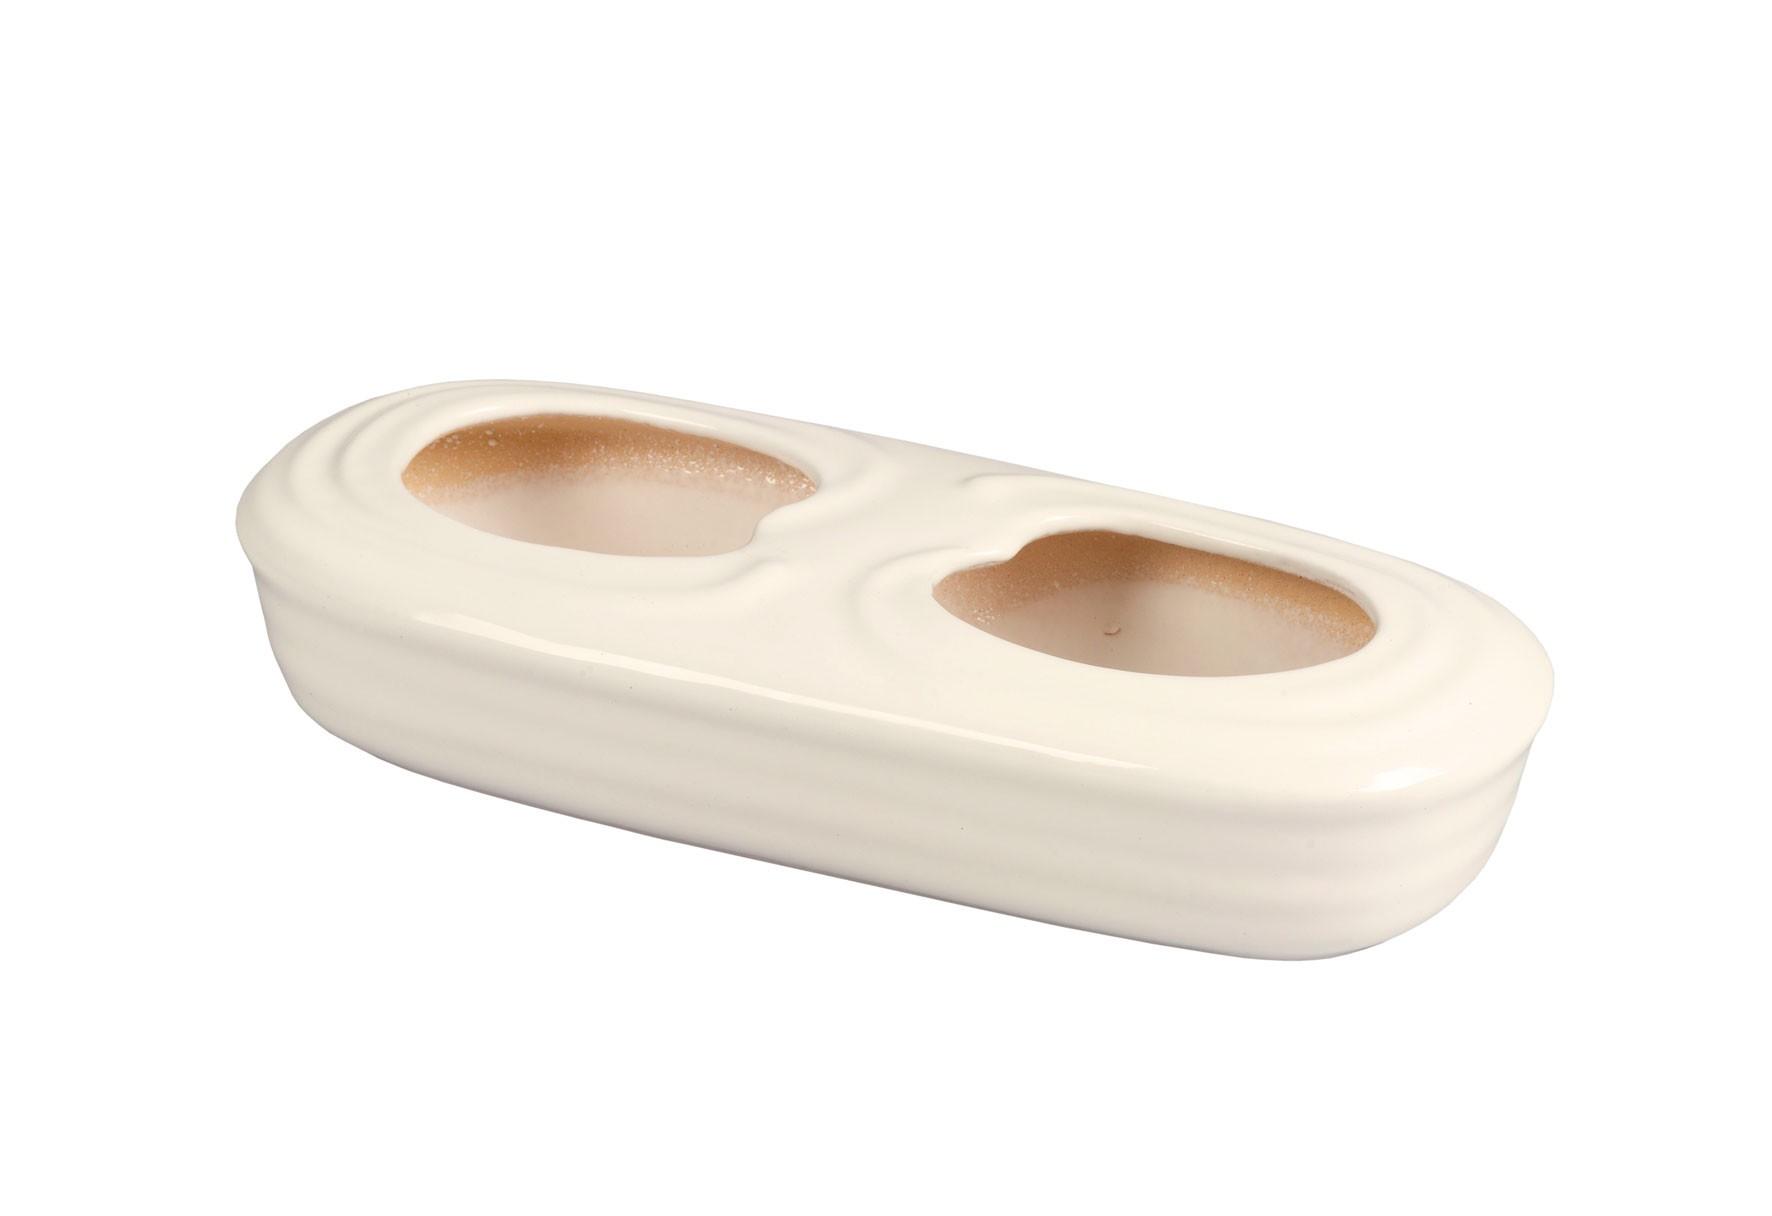 Luftbefeuchter / Verdunster Benta Keramik beige 1000 ml Bild 1